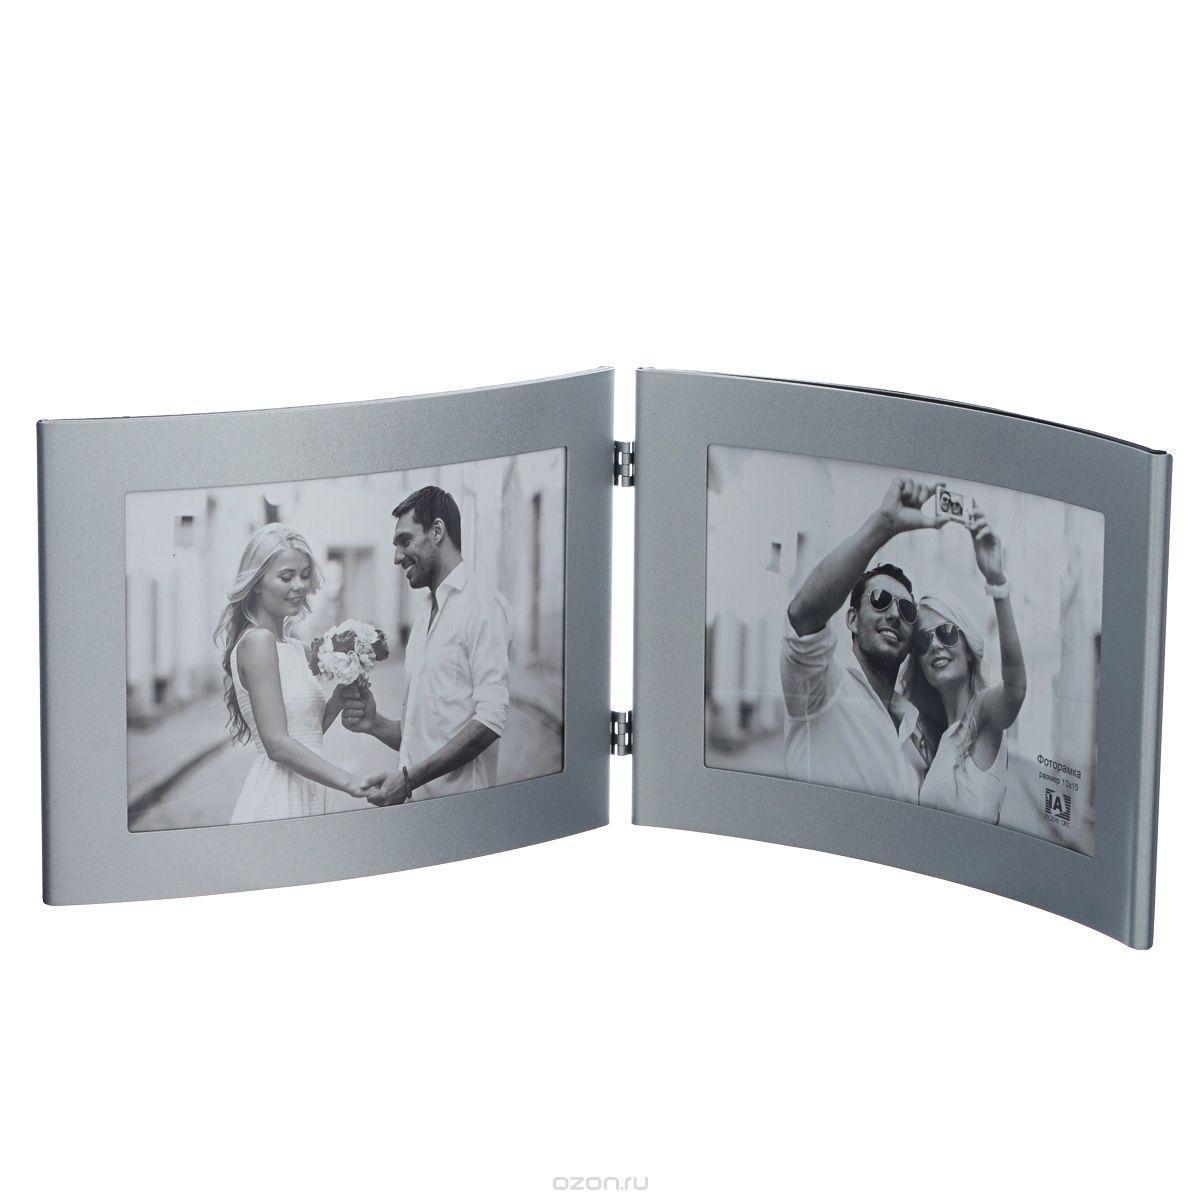 Фоторамка Image Art 6015/2-4S ( серебро) фоторамка букет роз на 2 фотографии